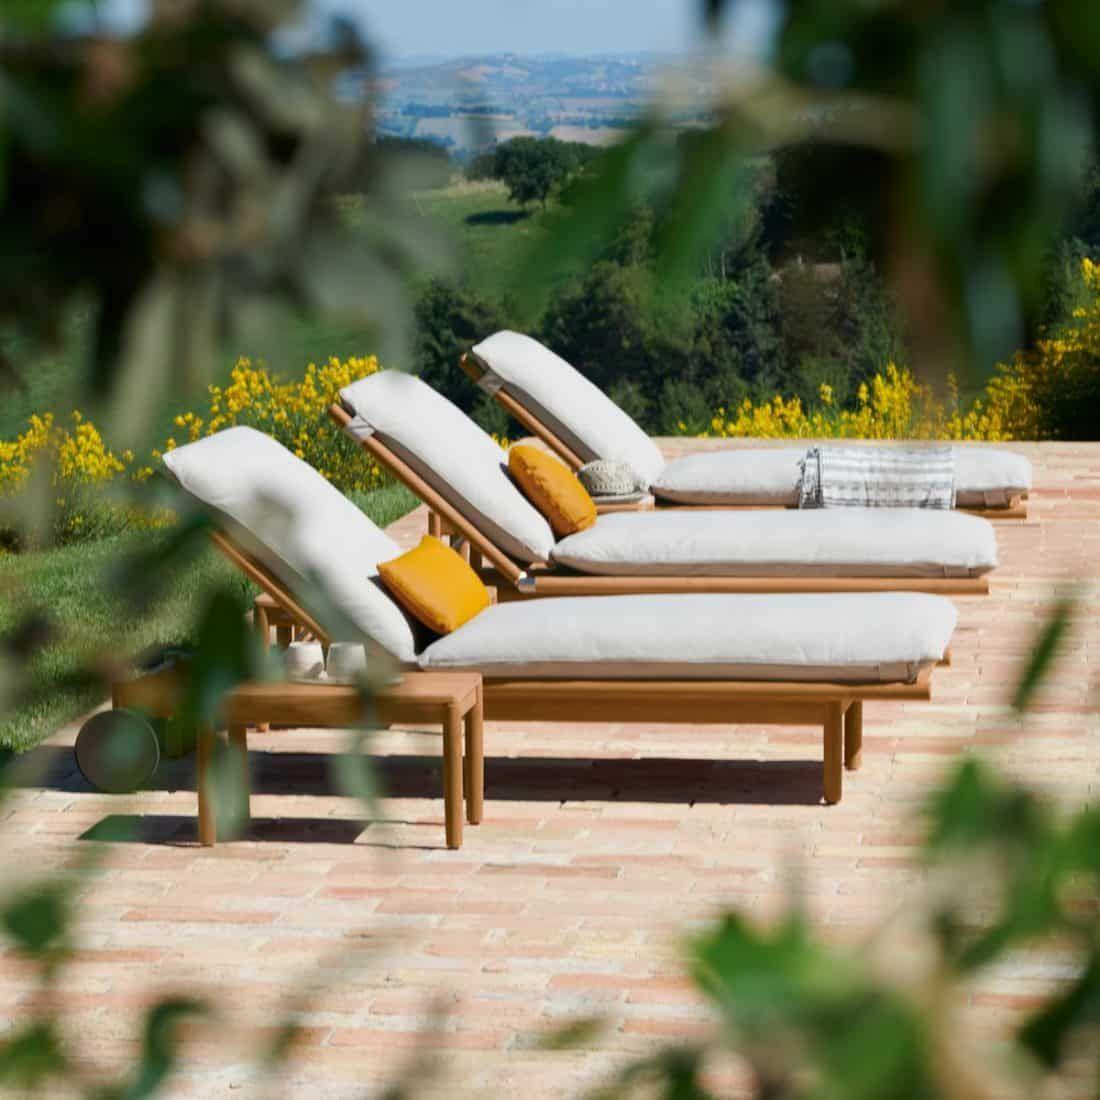 Italian Luxury Furniture Designer Furniture Singapore Da Vinci Lifestyle Contemporary Furniture Design Beach Chairs Sun Lounger